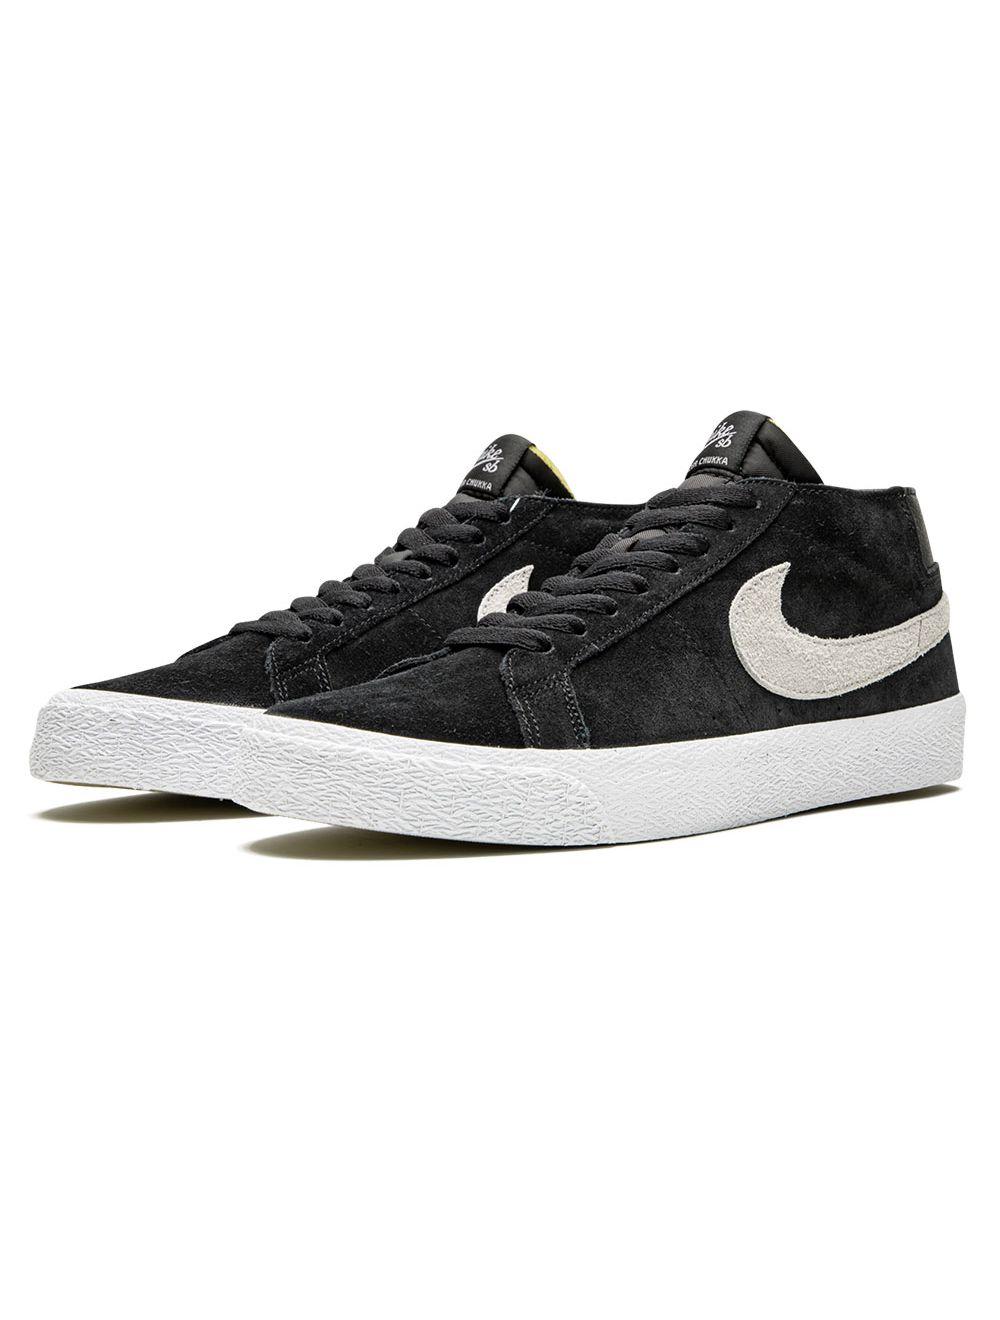 Nike SB. Zoom Blazer Chukka. Black